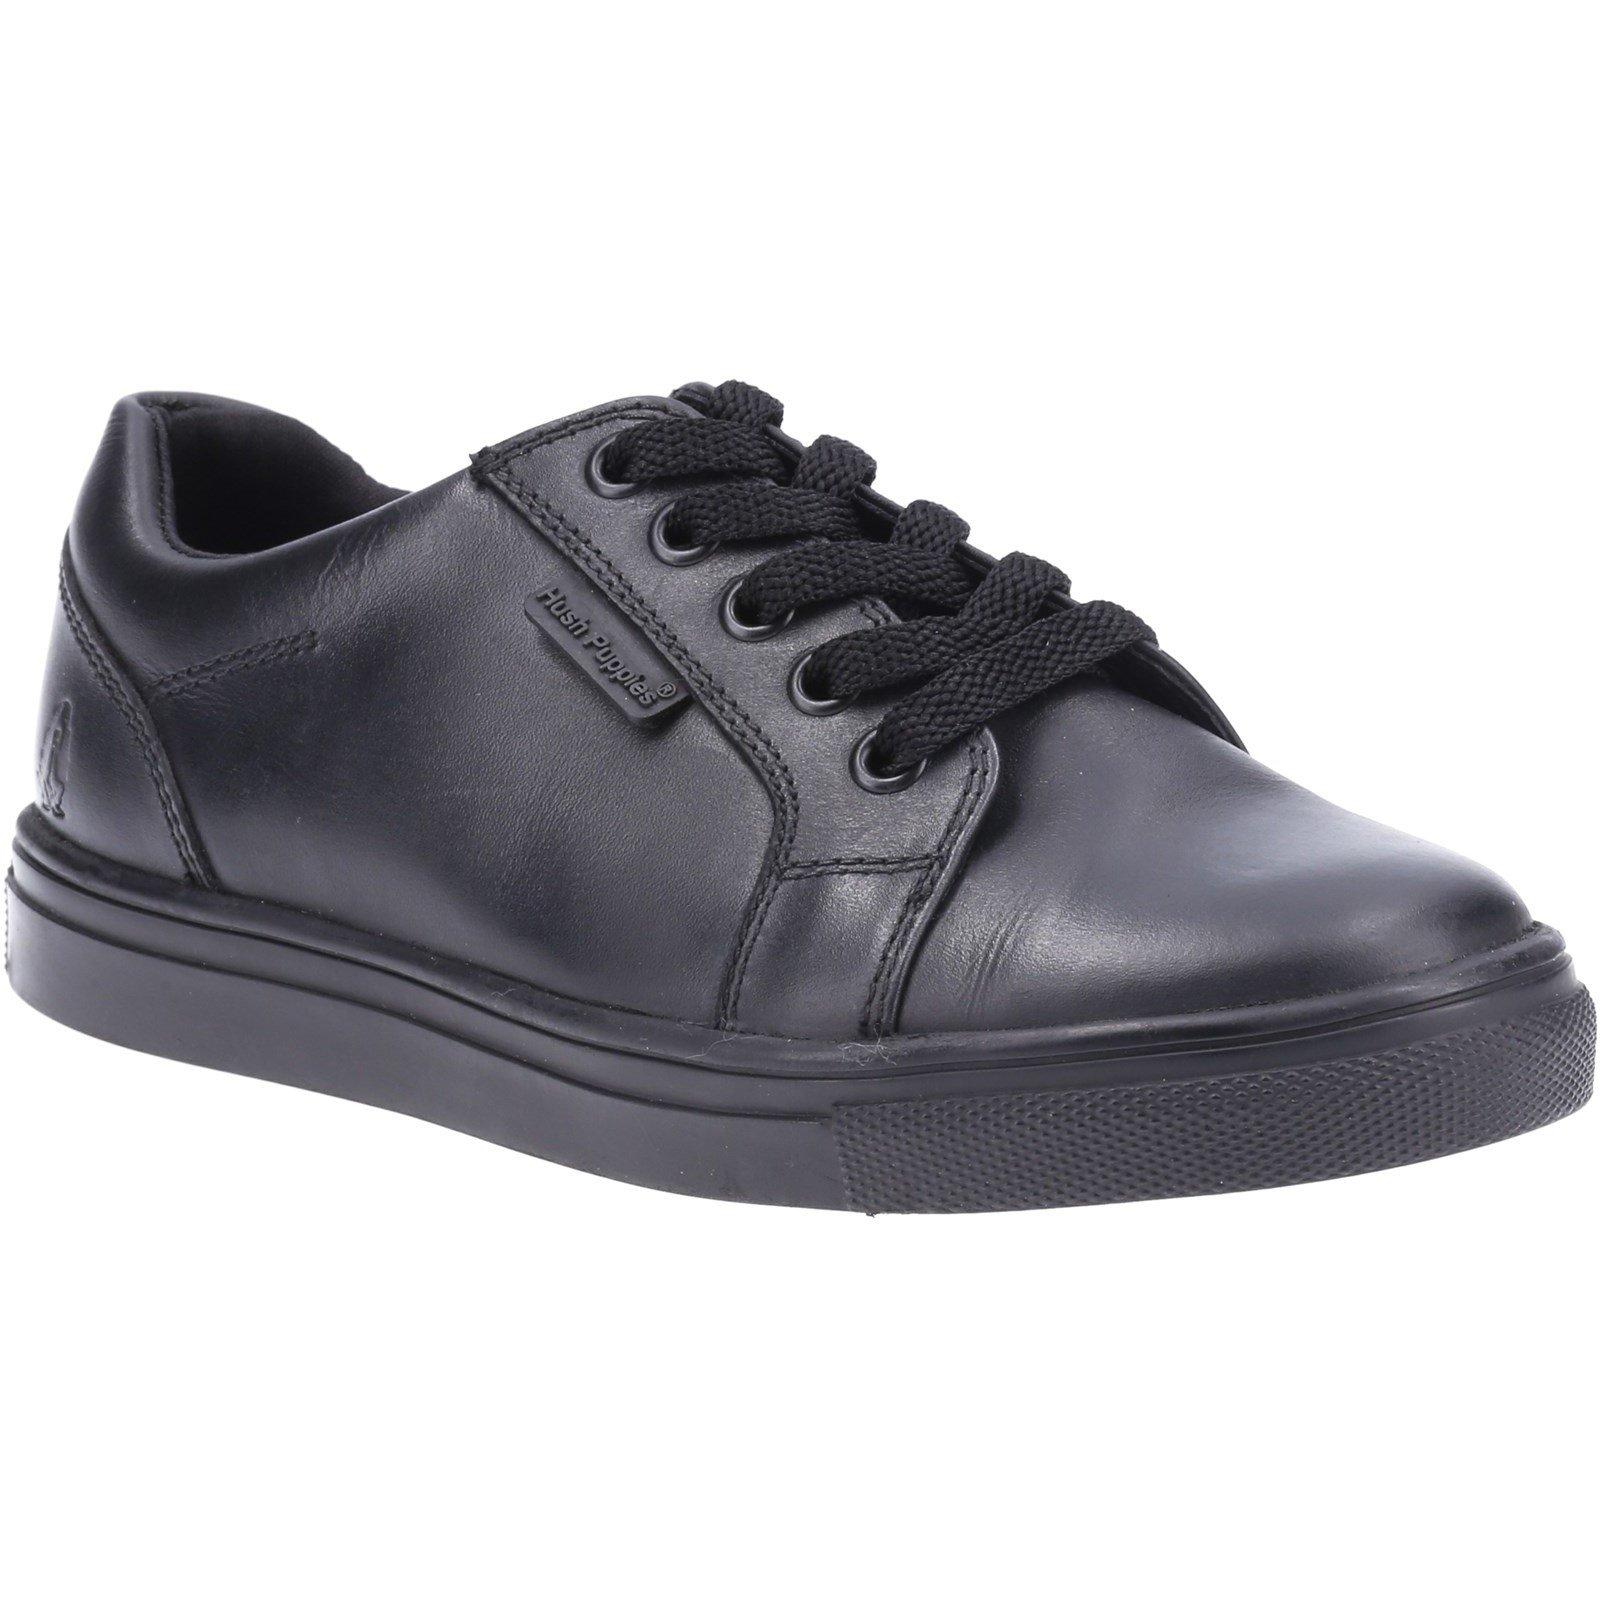 Hush Puppies Kid's Sam Junior School Shoe Black 32579 - Black 10